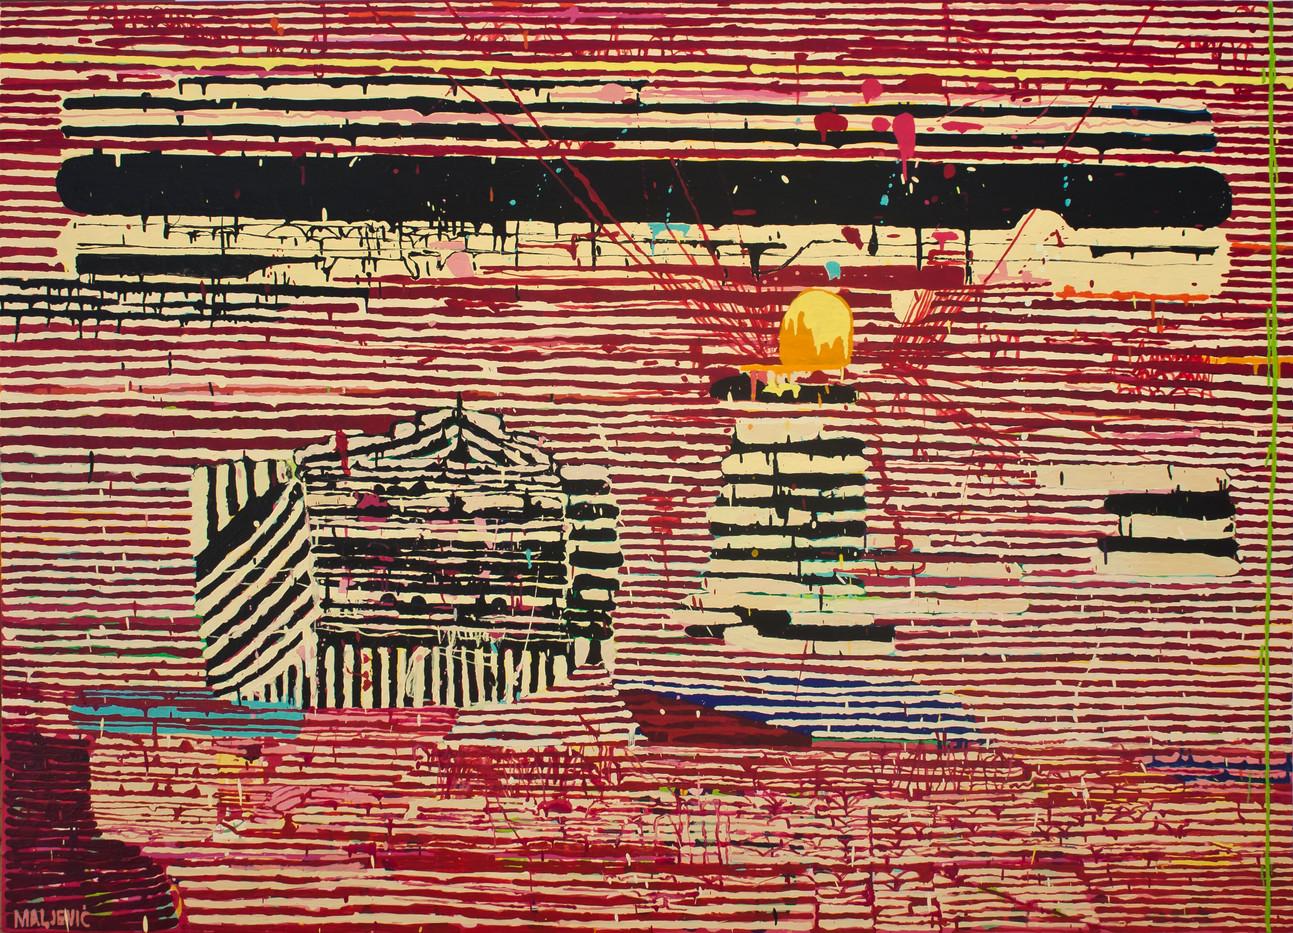 Maja Maljevic | Between the Lines | 2013 | Oil on Canvas | 150 x 200 cm